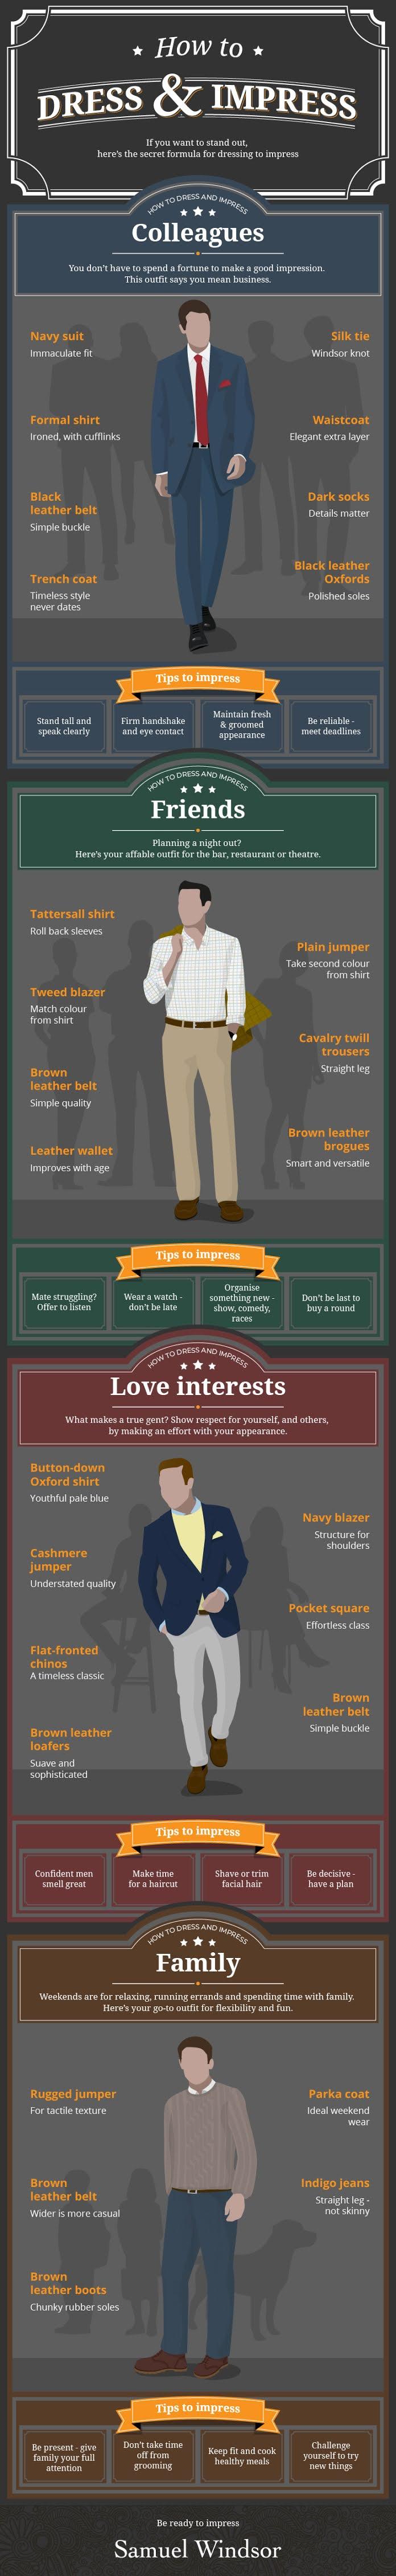 How To Dress and Impress #infographic #Dress #Fashion #Impress #Men Fashion